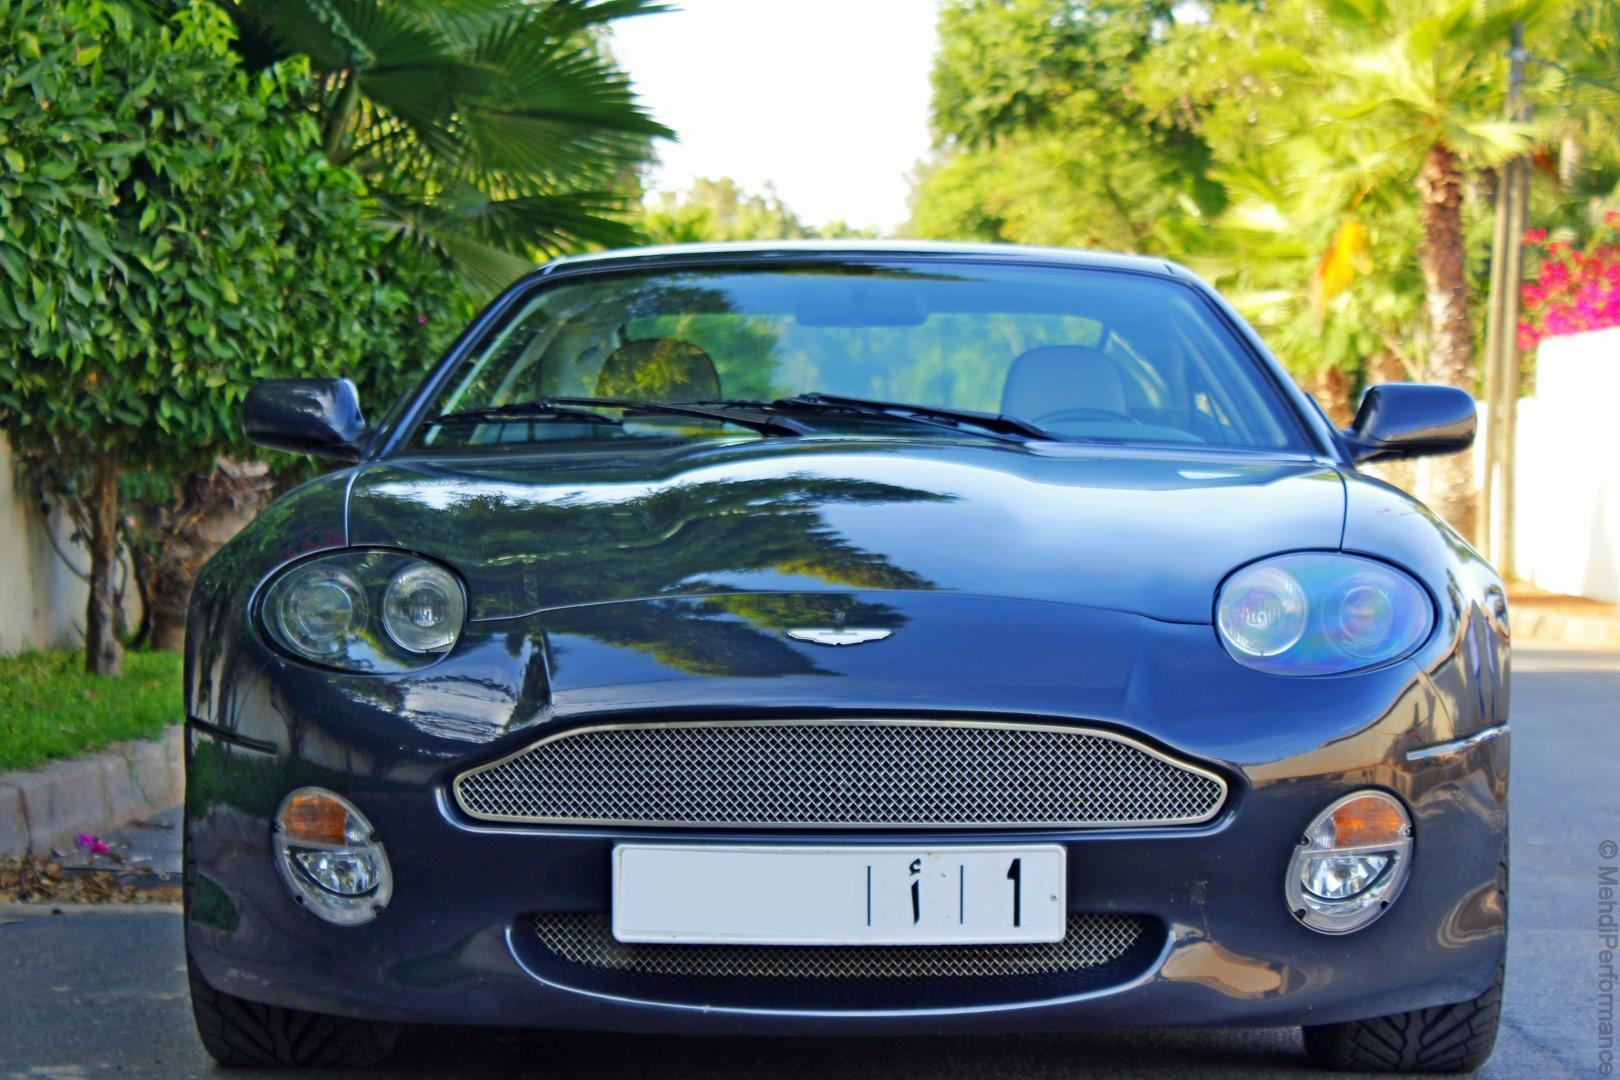 db7-vantage-l-une-des-rares-aston-martin-au-maroc-431-2.jpg